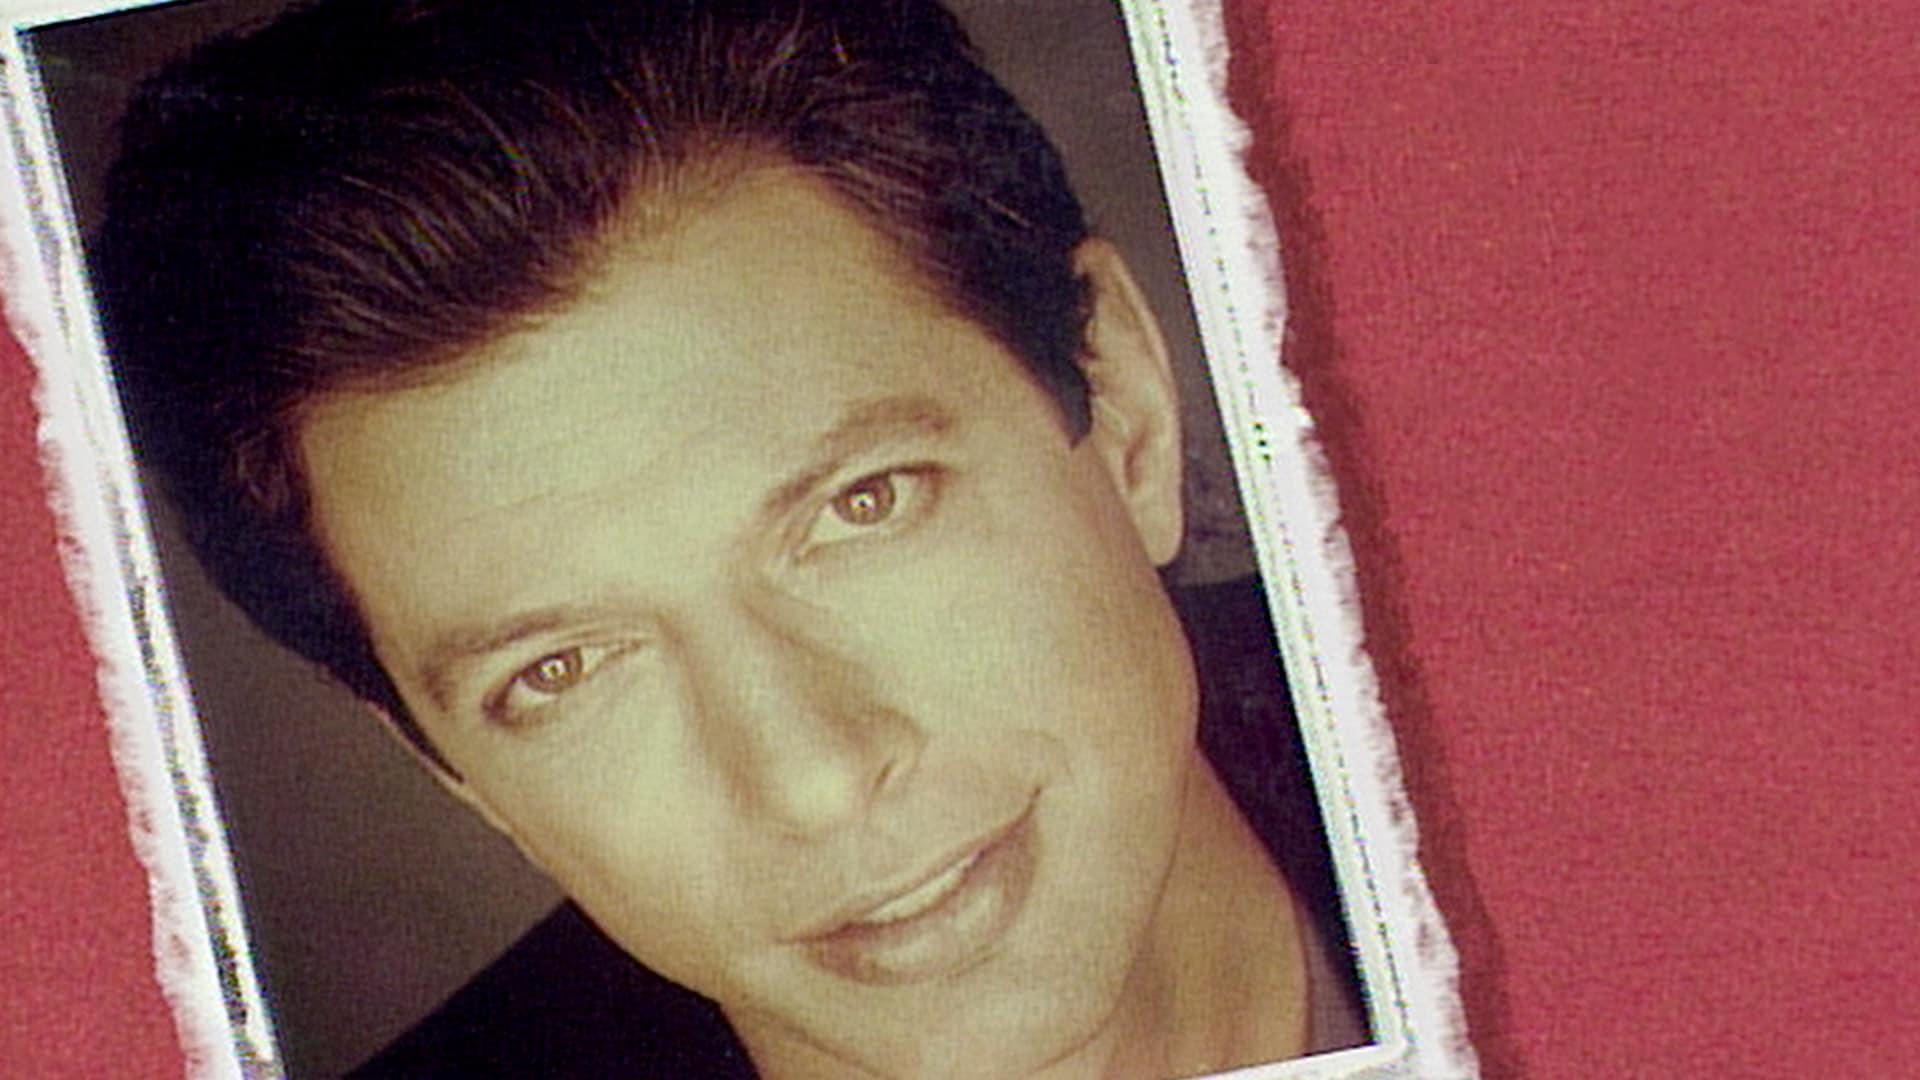 Jeff Goldblum: October 9, 1993